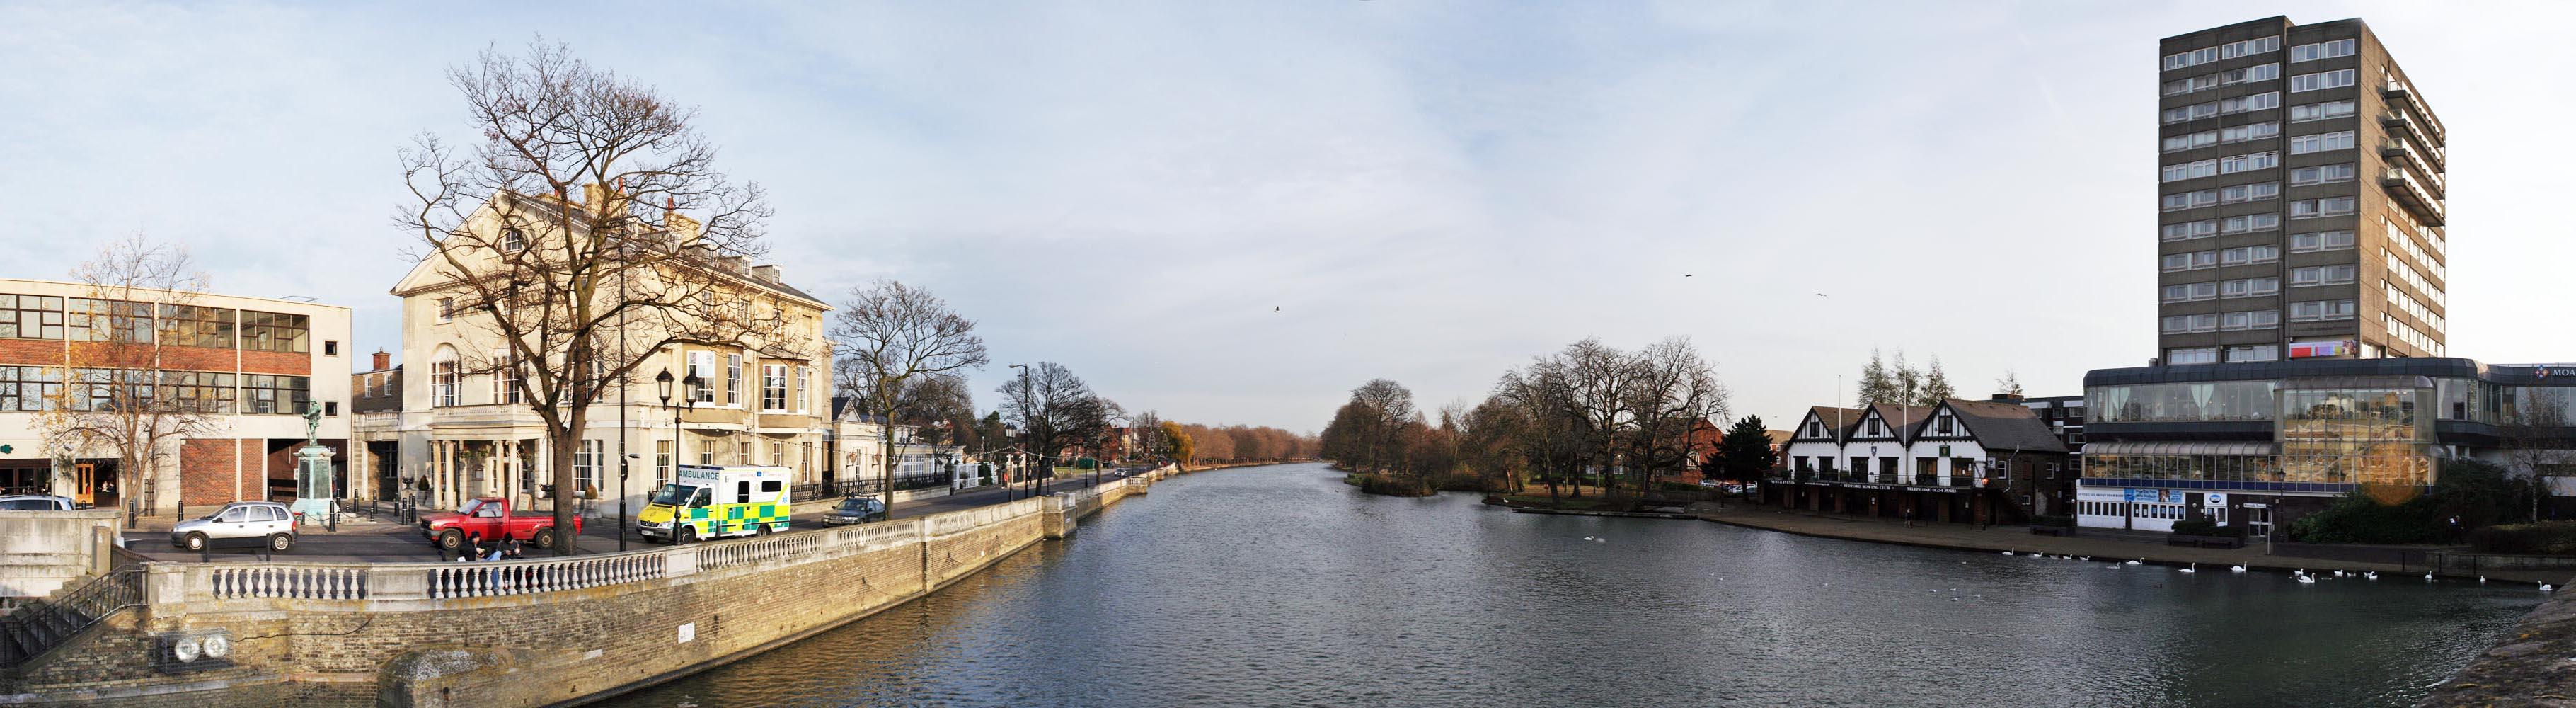 Bideford United Kingdom  City new picture : River Great Ouse in Bedford Colmworth, United Kingdom